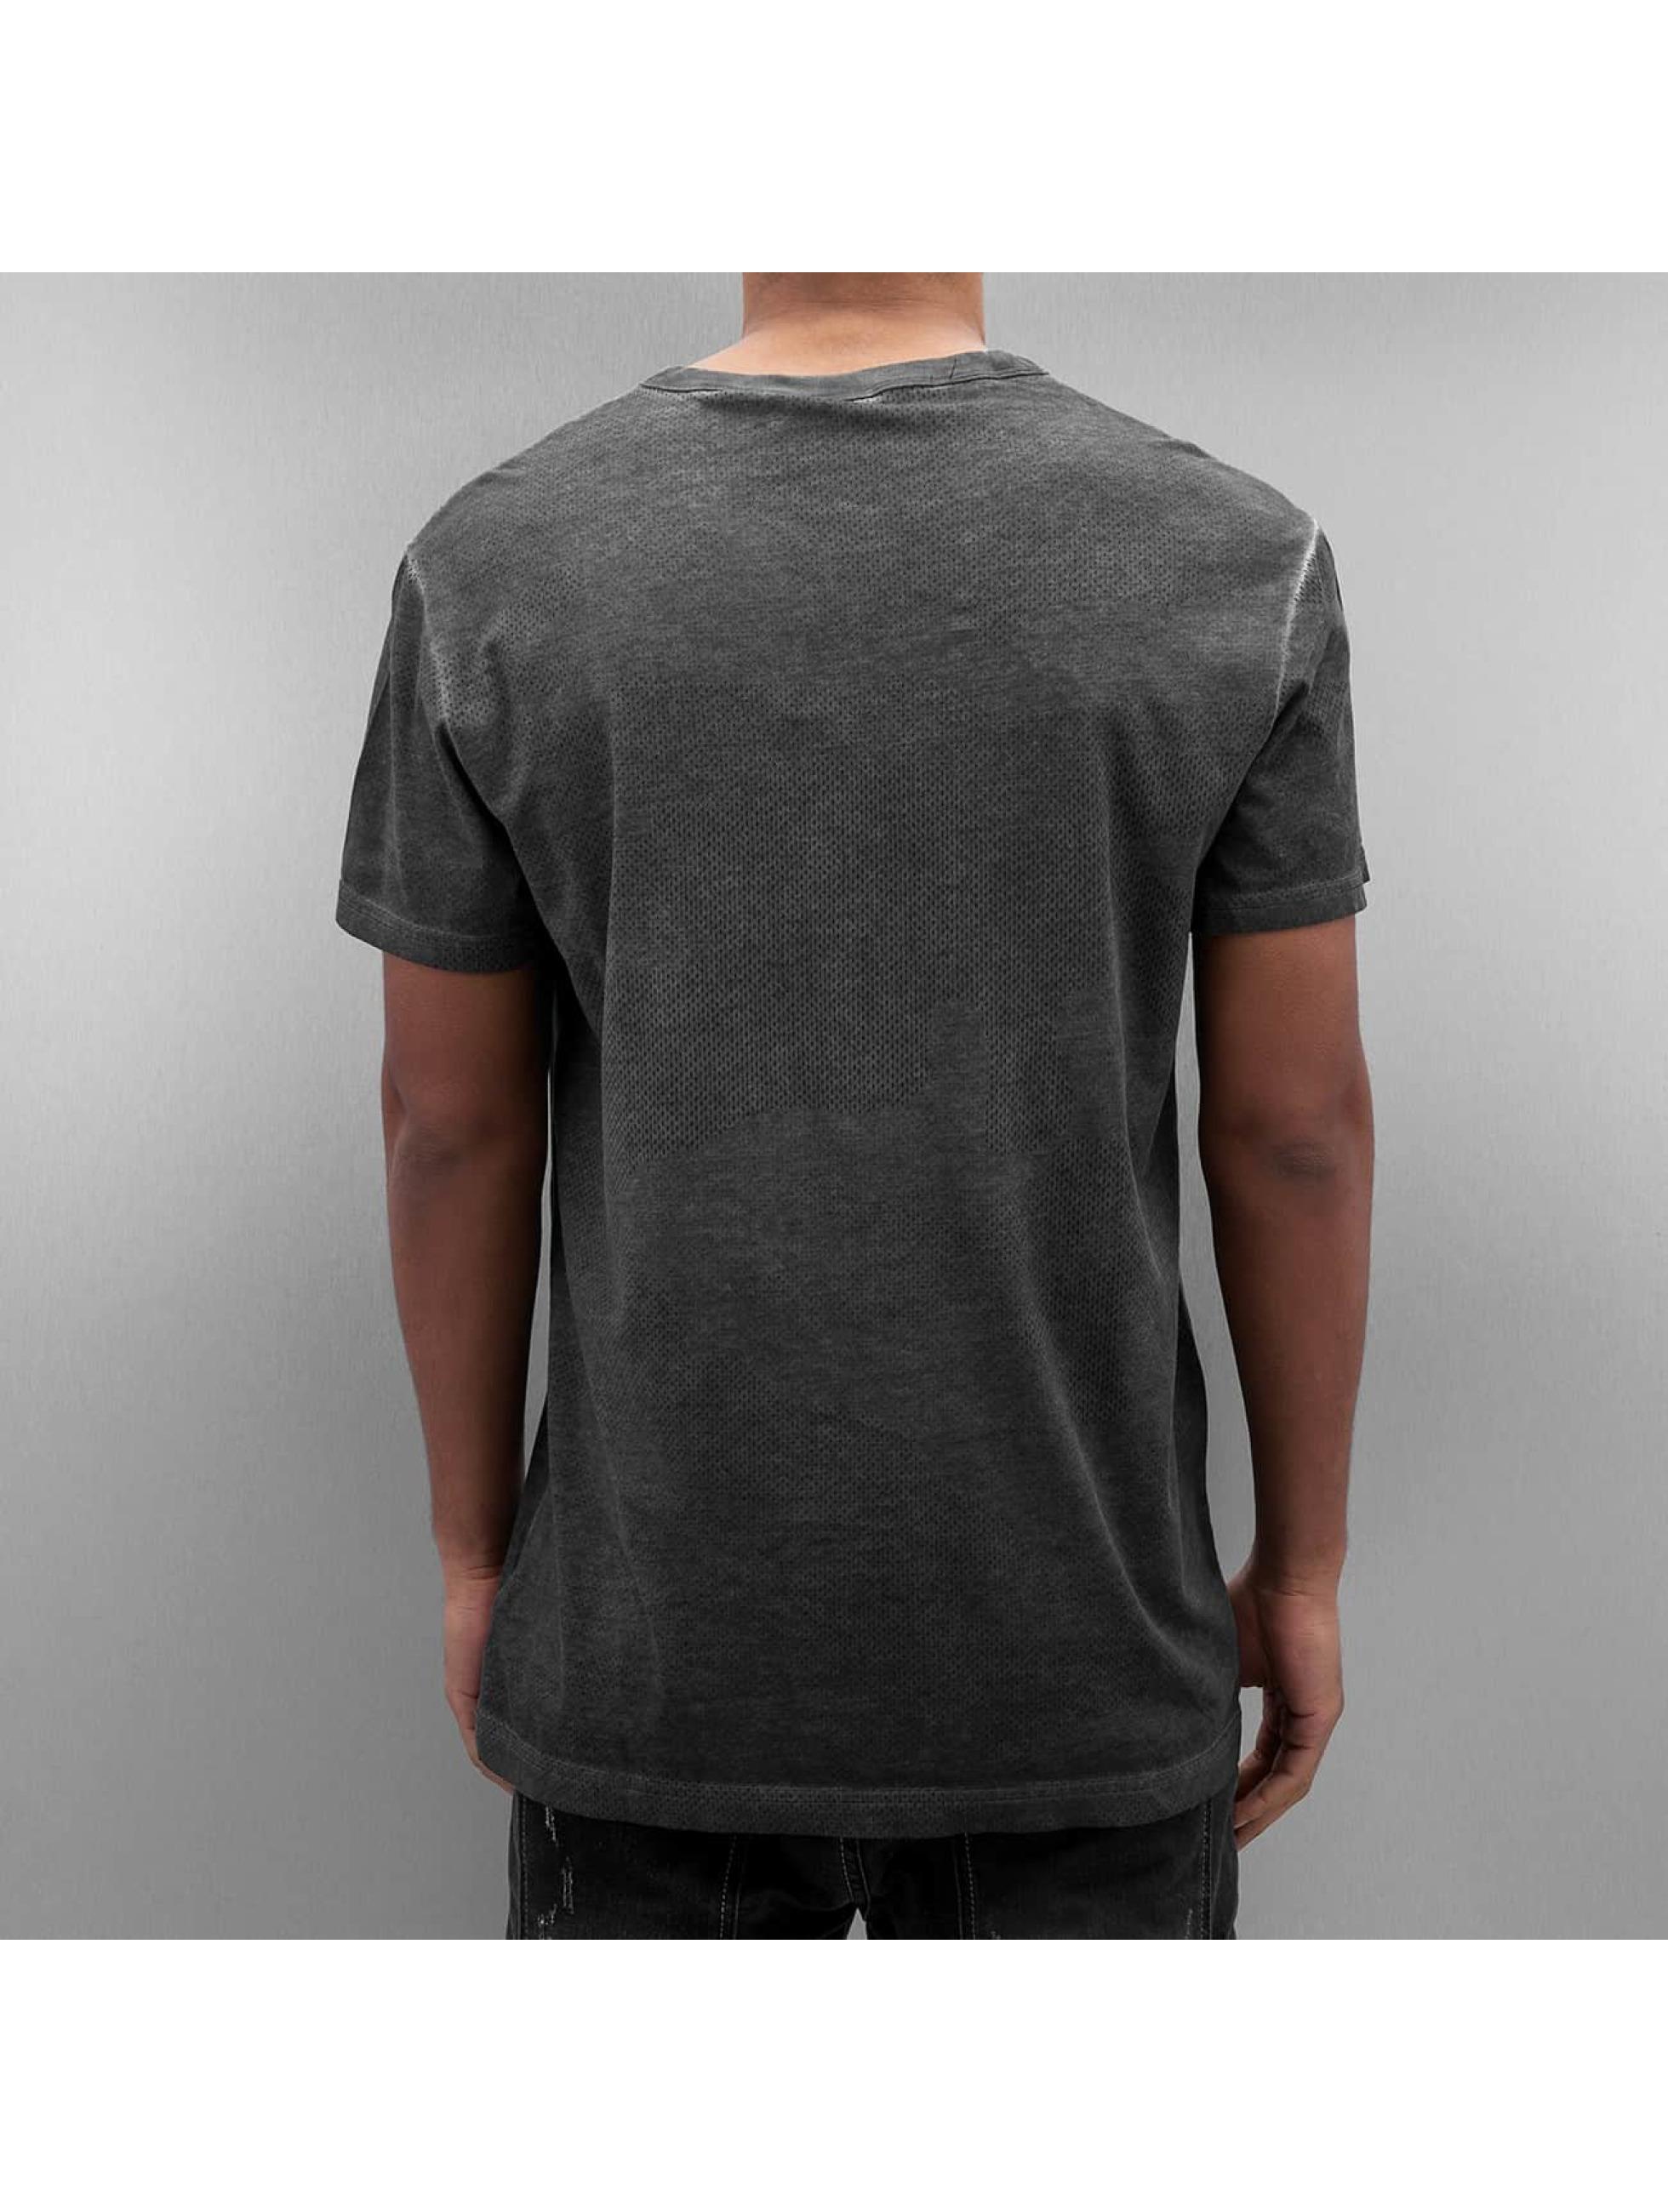 G-Star-Uomini-Maglieria-T-shirt-Meon-Youn-Jersey-nero-310858-S